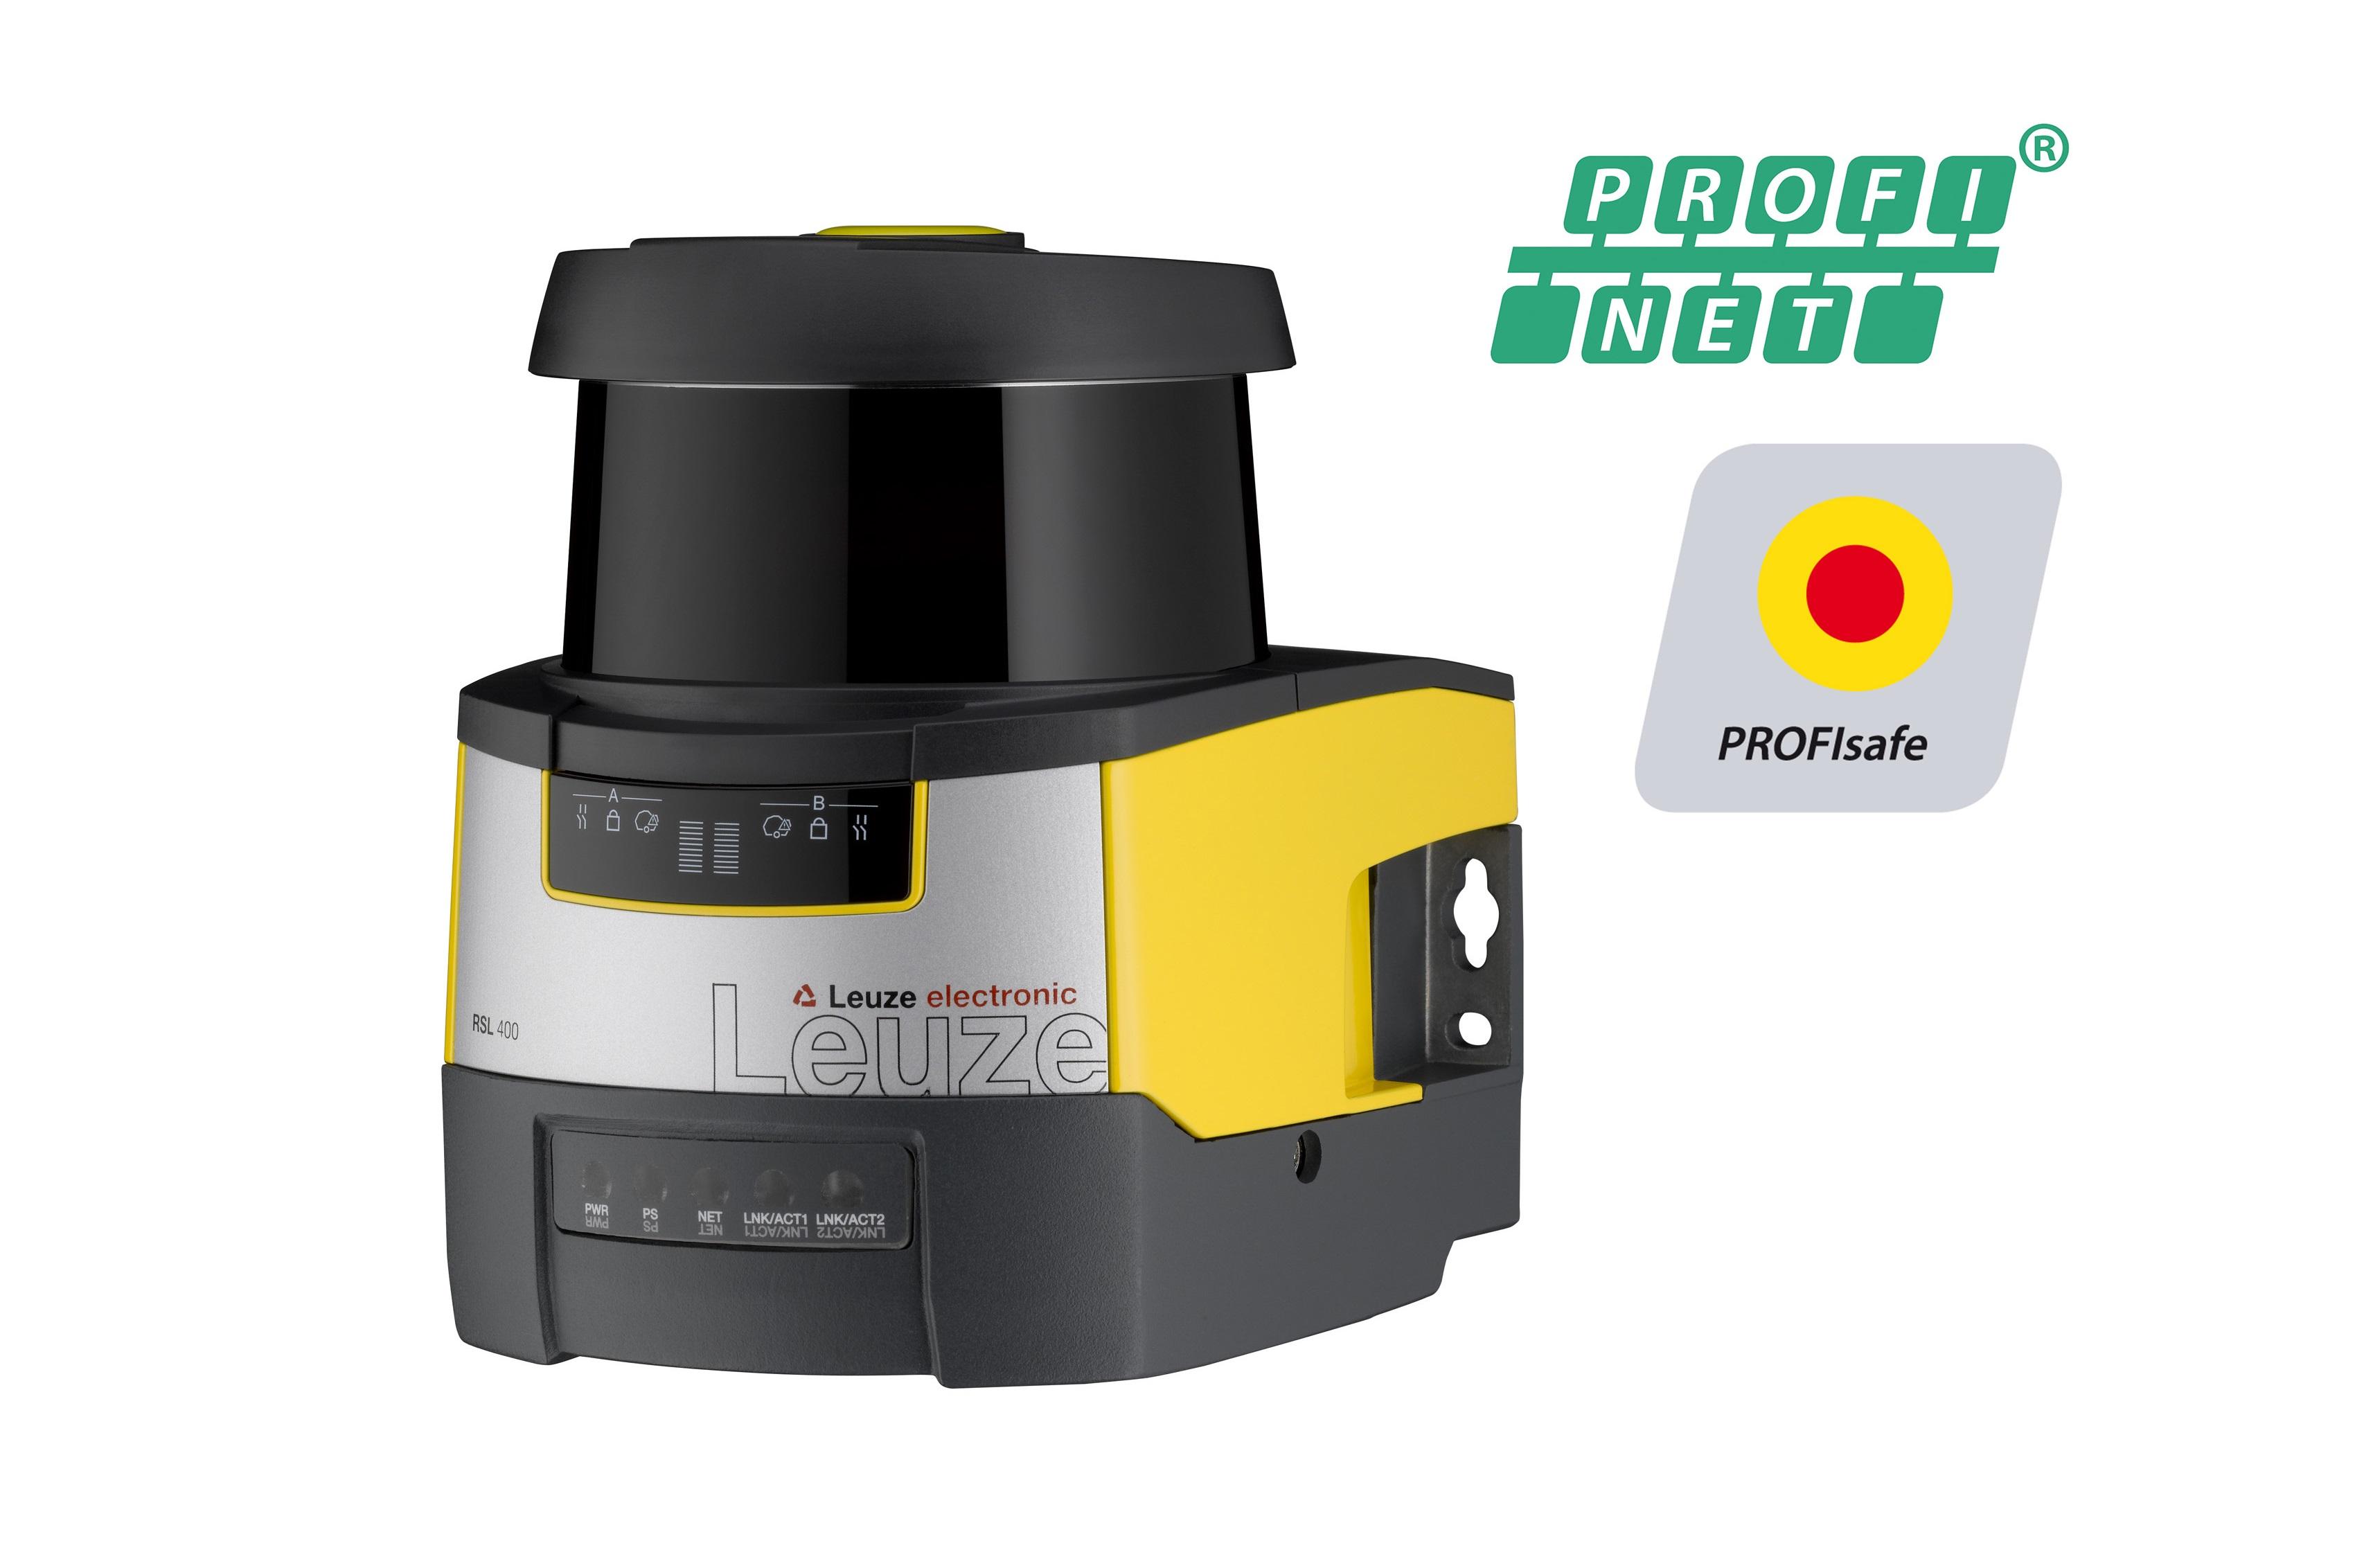 RSL 400 PROFIsafe con PROFINET: el éscaner láser de seguridad de Leuze